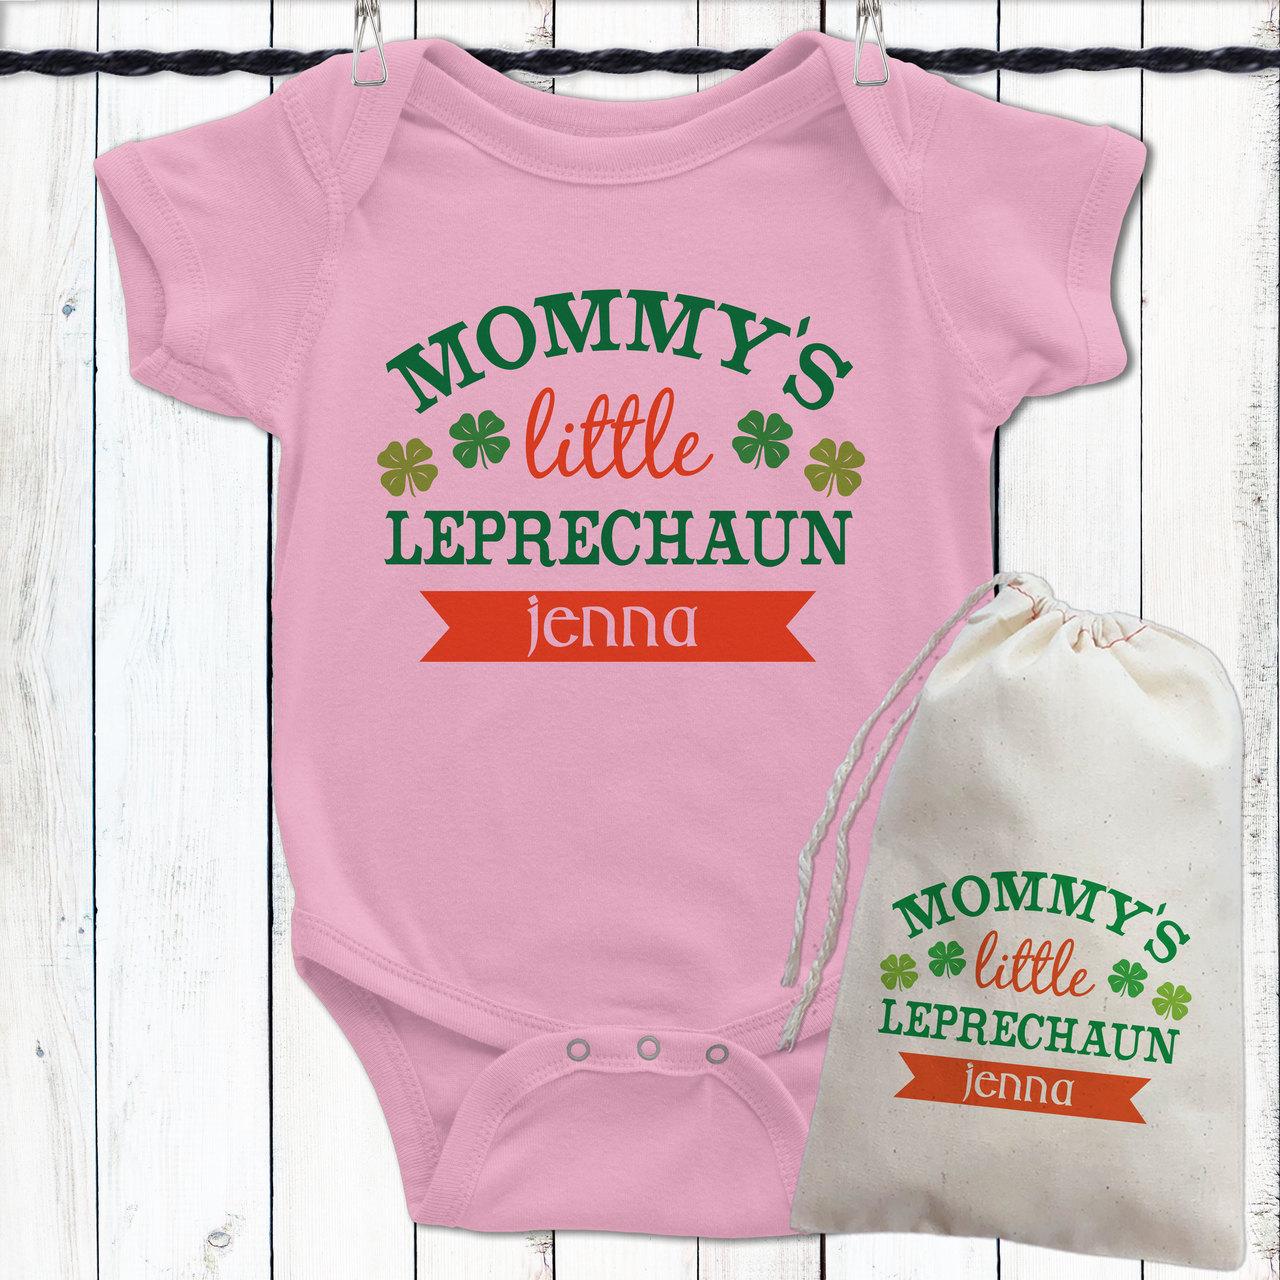 1e0d3d787 Personalized St. Patrick's Day Baby Shirts - Little Leprechaun